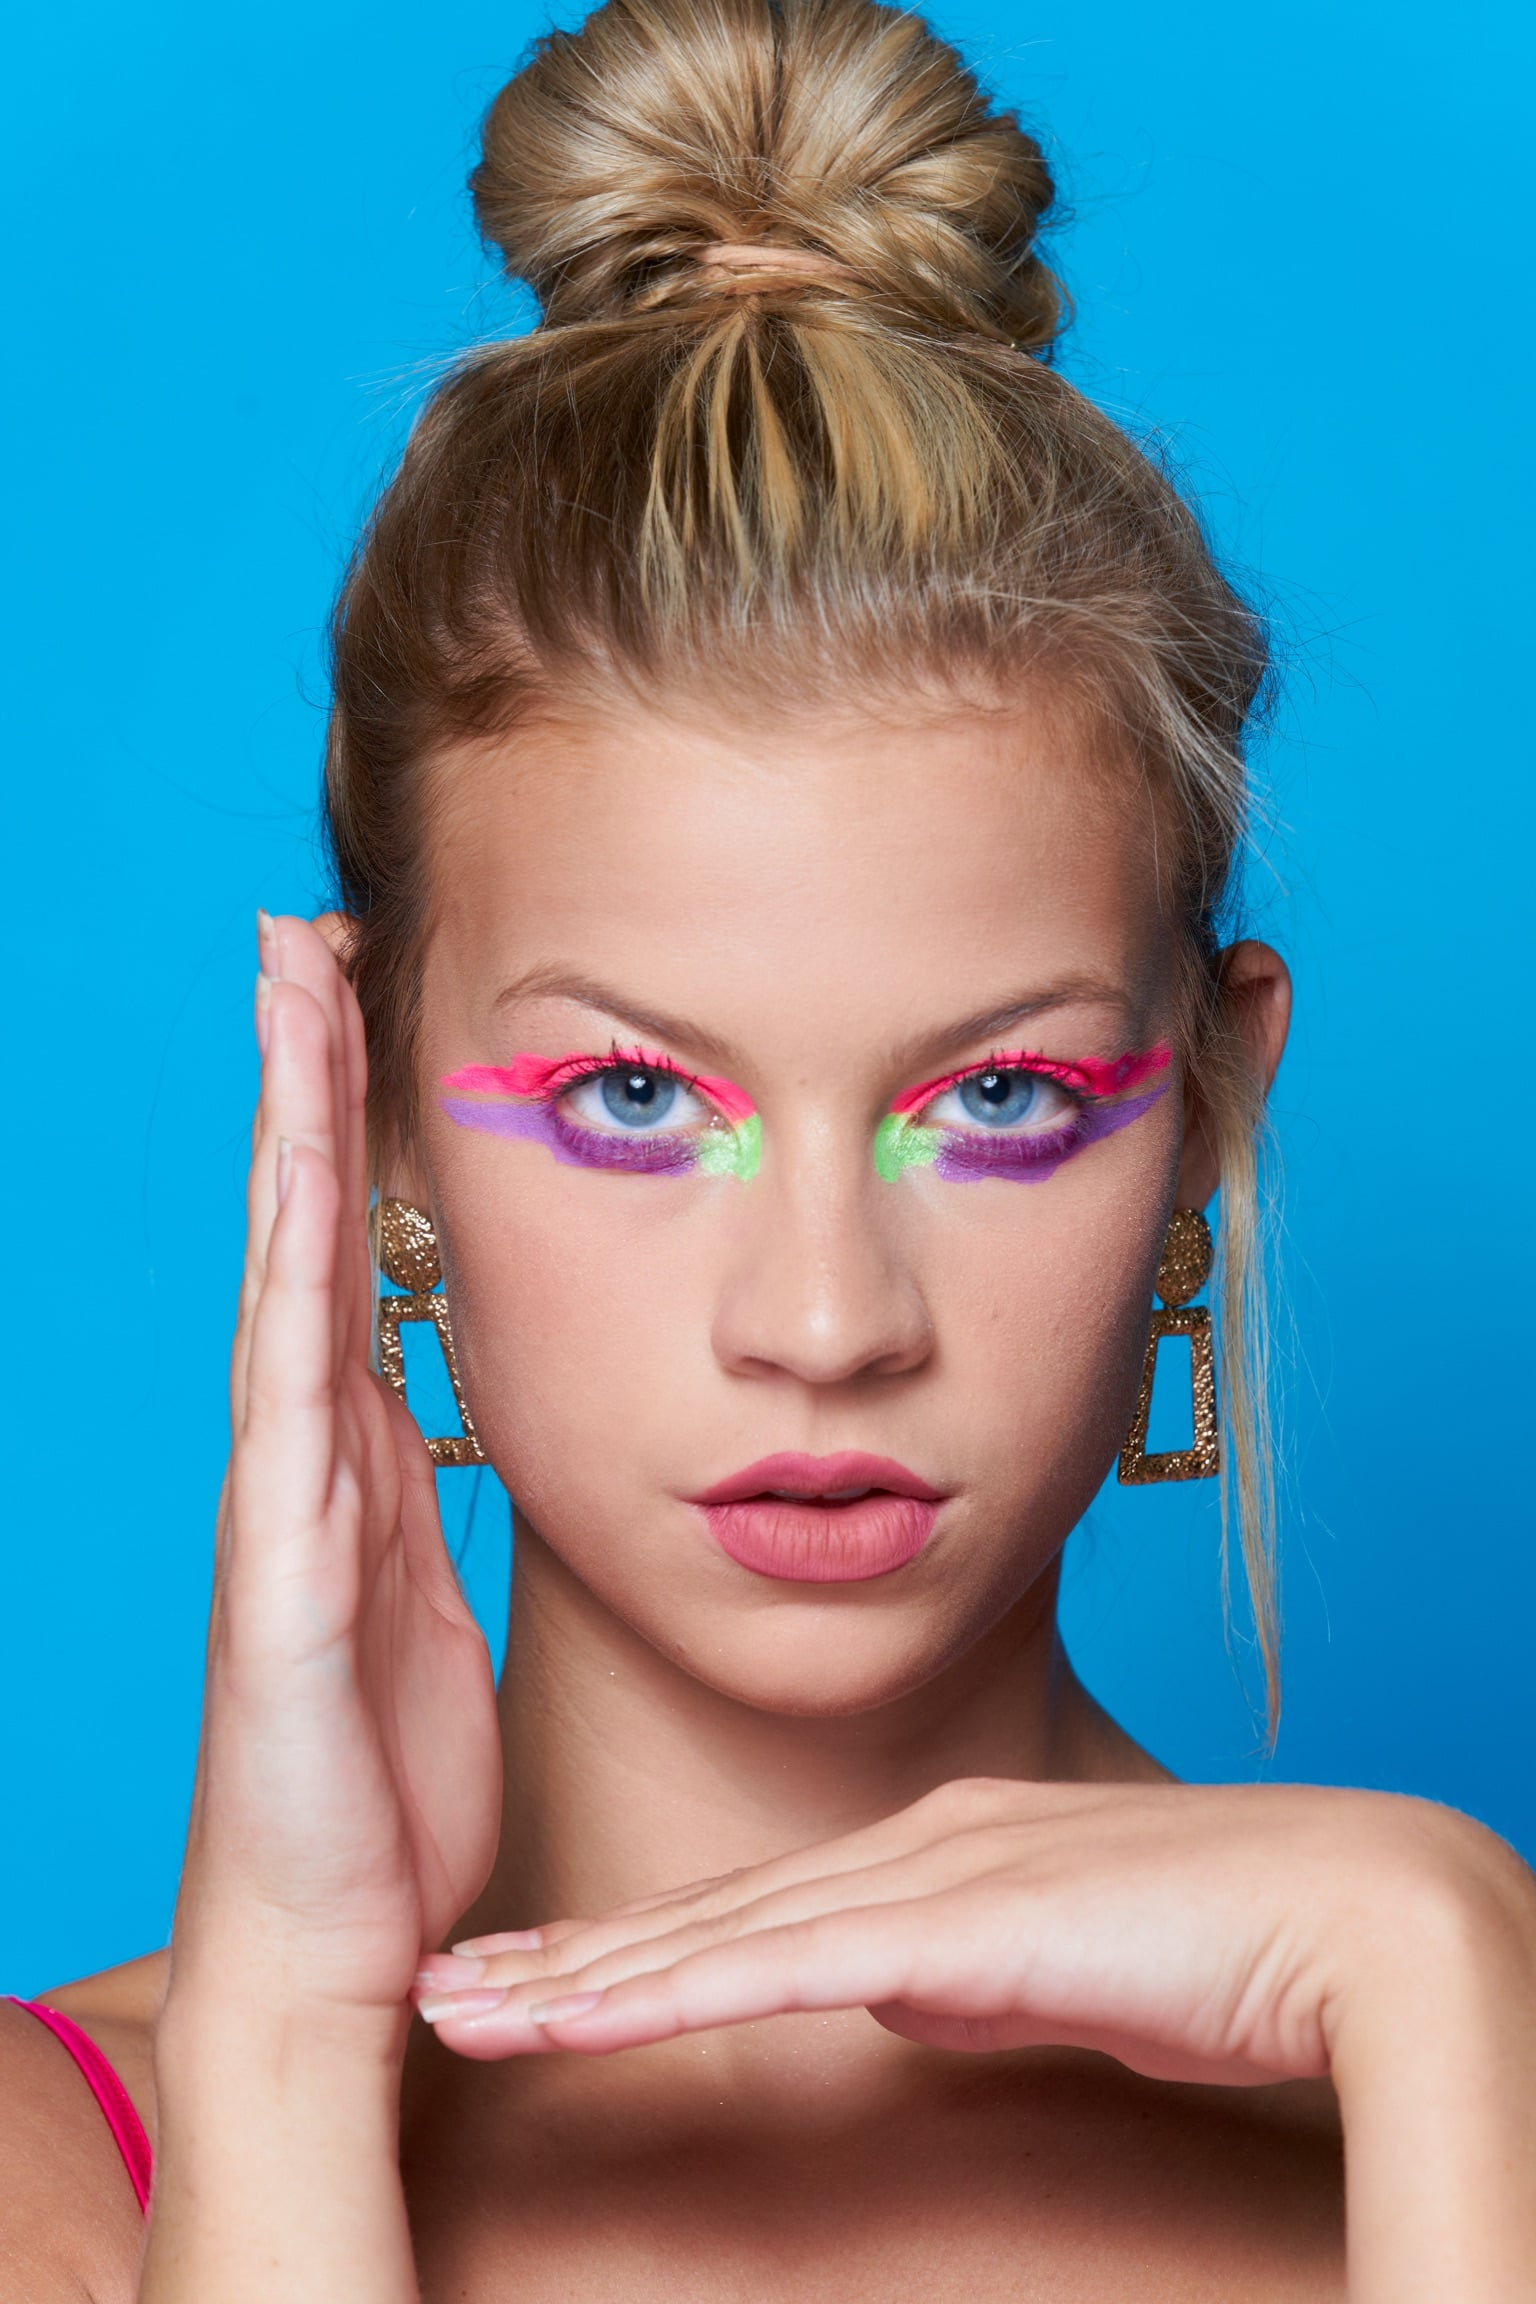 Makeup Artist Uses TikTok to Educate on Ulcerative Colitis 3